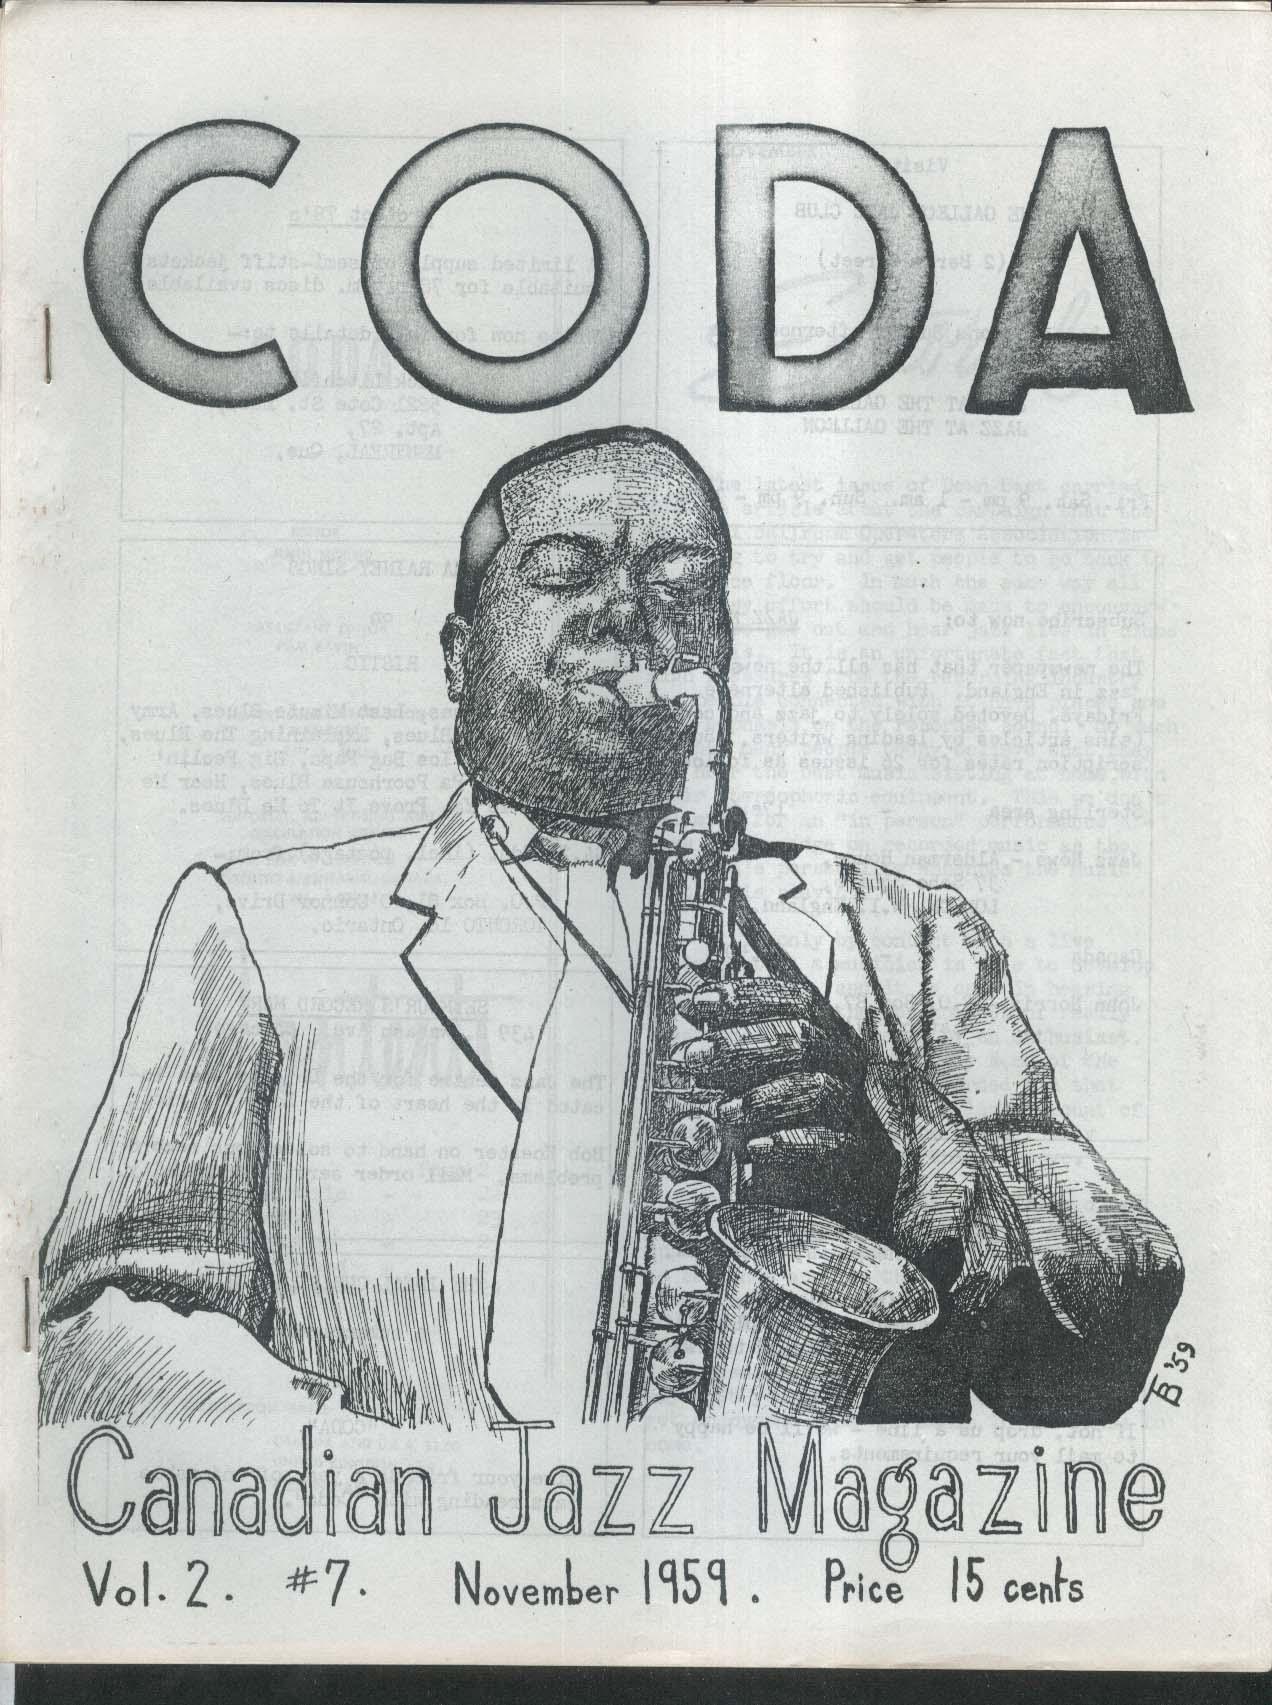 CODA V2 #7 Canadian Jazz Magazine Paul Barbarin Kant Argue Chris Barber 11 1959